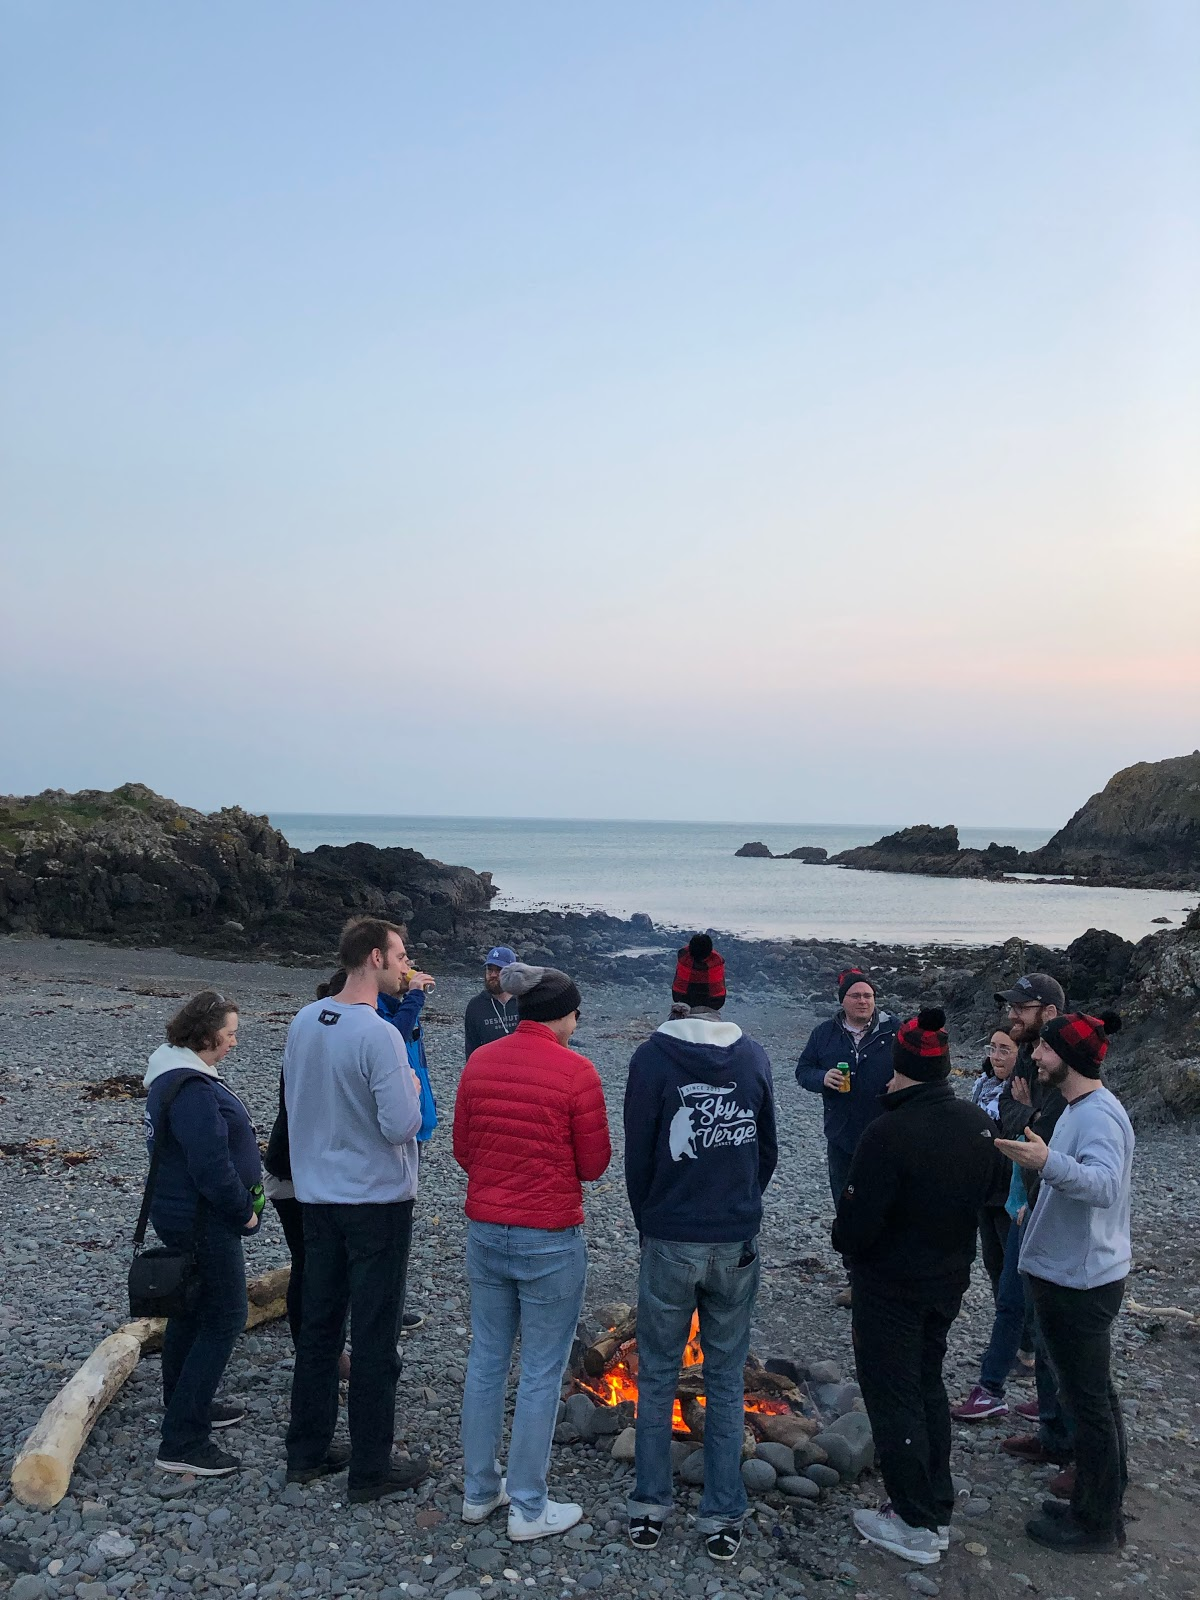 Team SkyVerge beach bonfire in Scotland